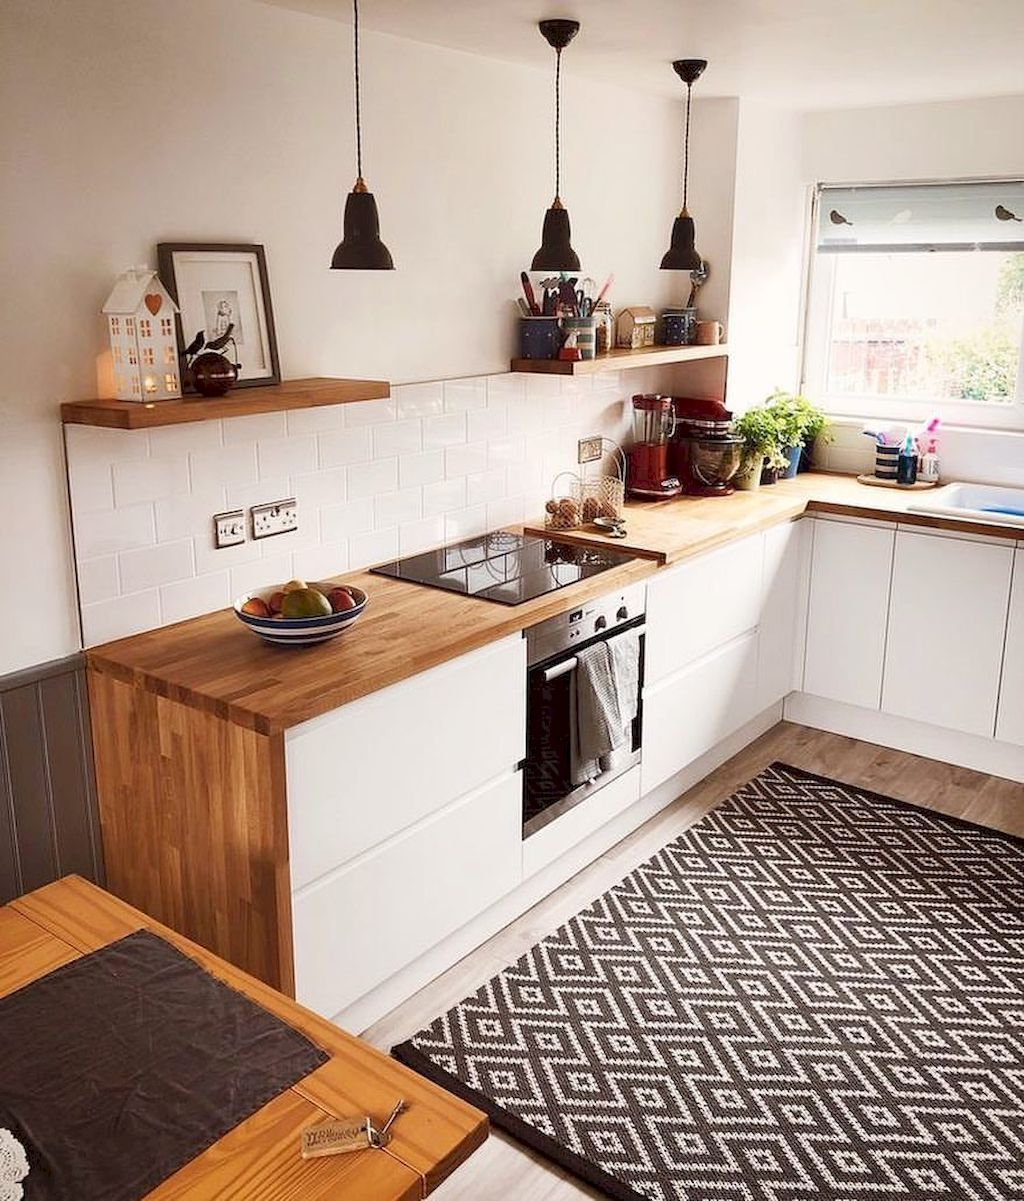 captivating minimalist kitchen simple designs also best design images in rh pinterest